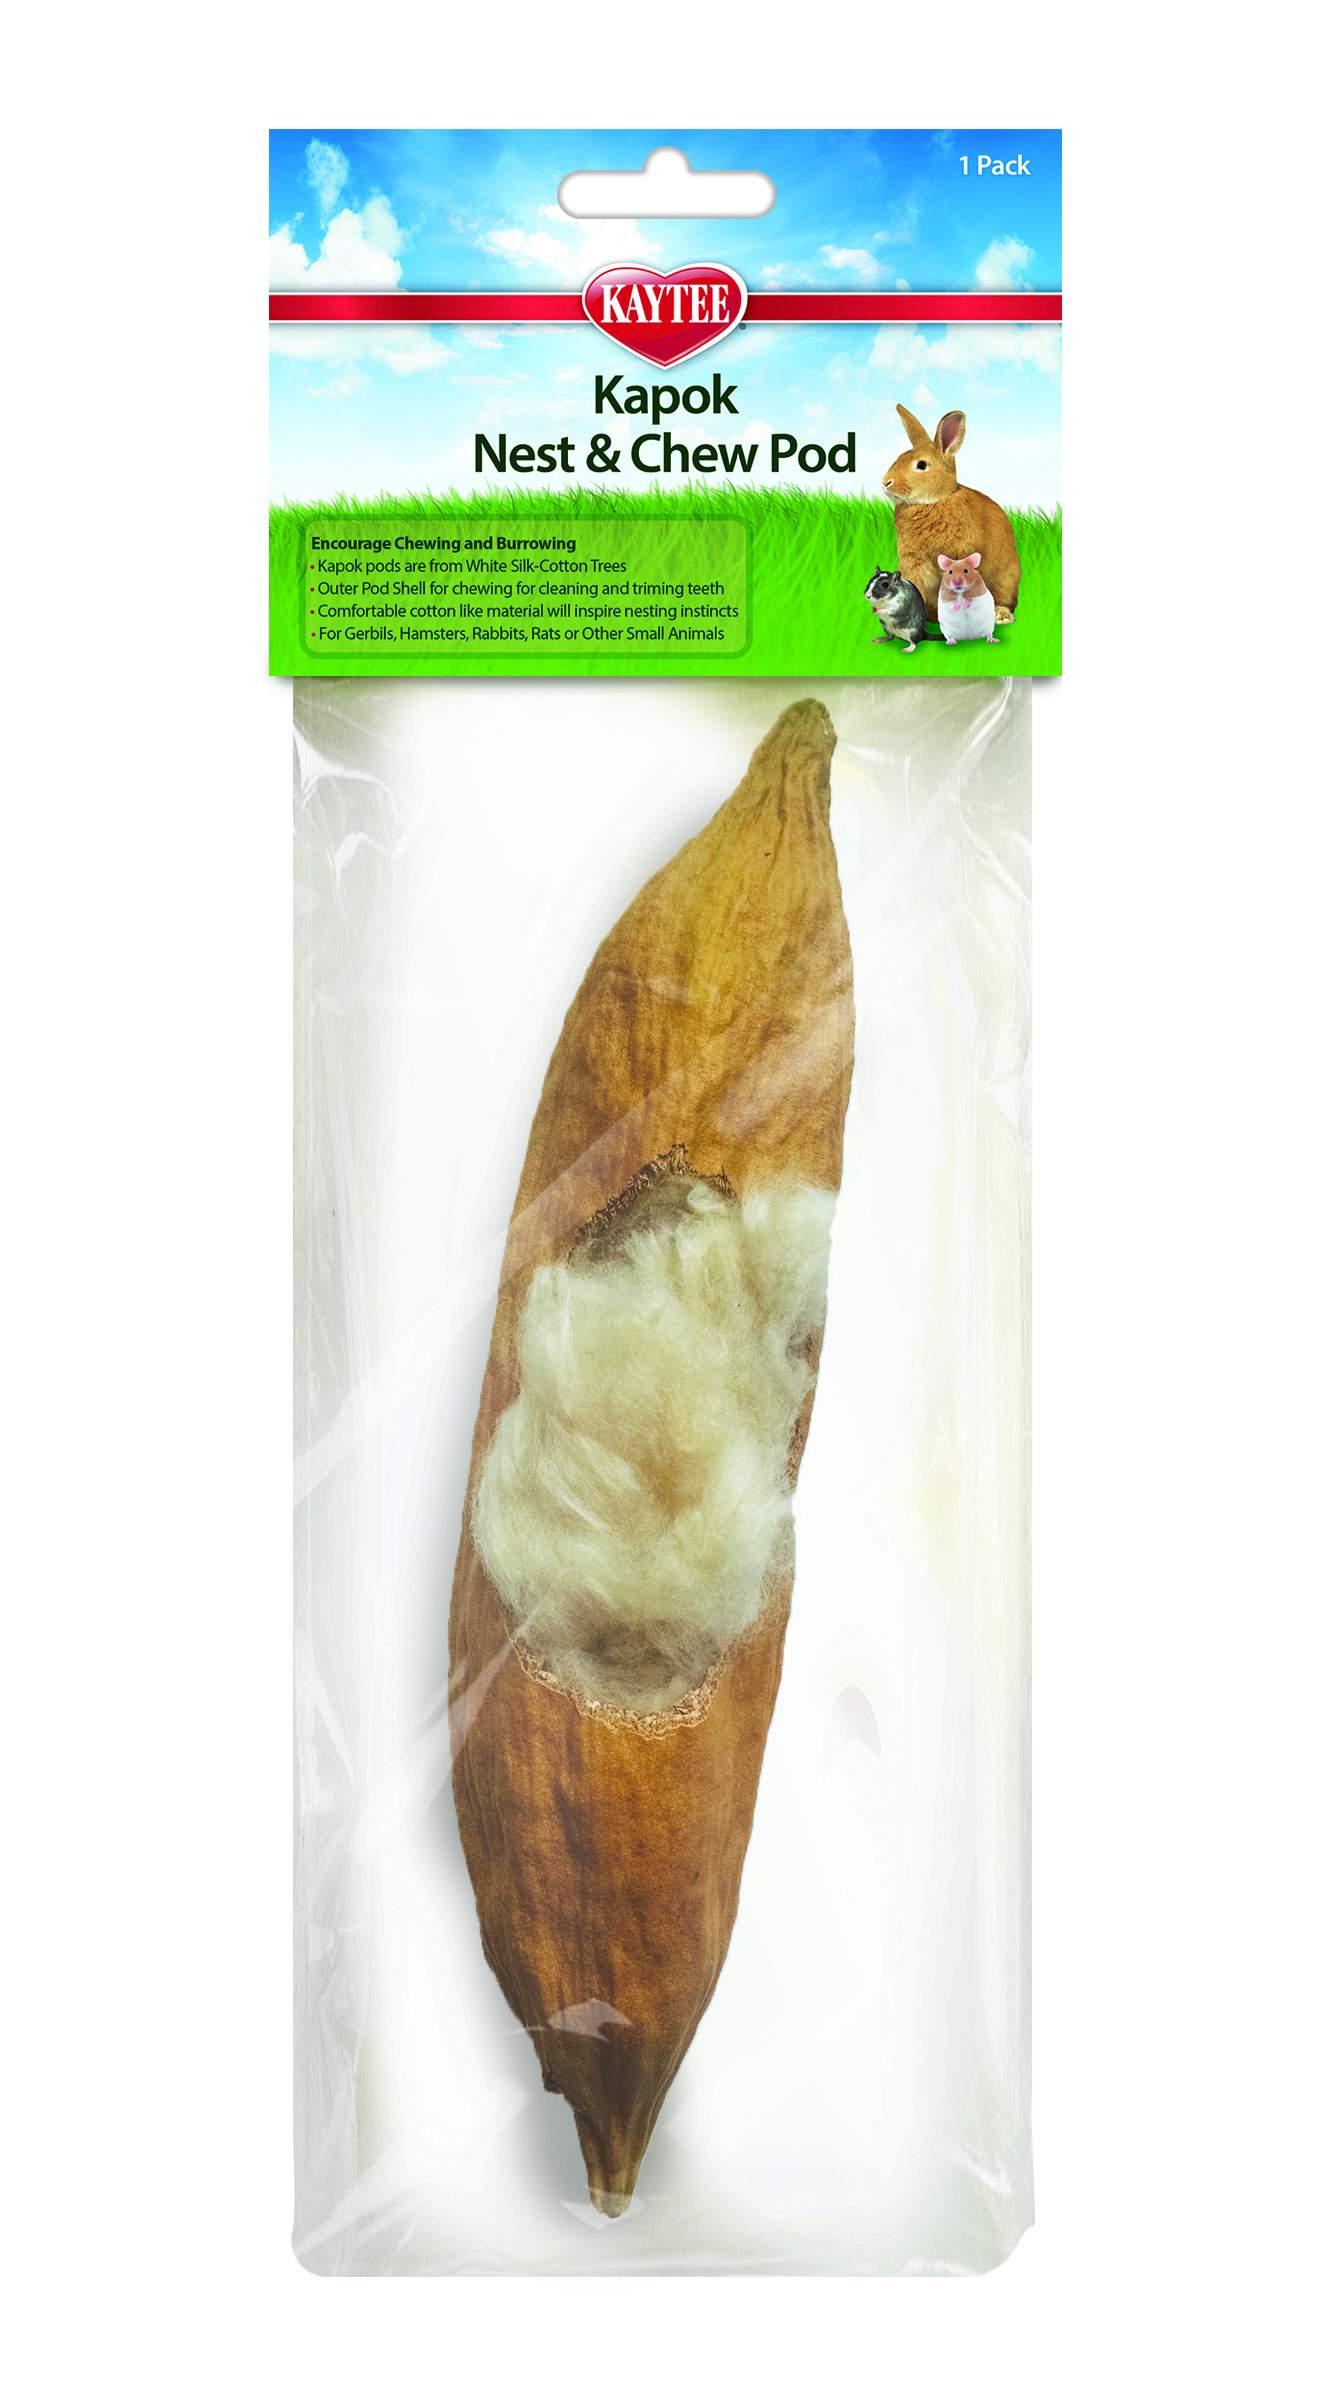 Kaytee Kapok Nest & Chew Pods for Small Animals, 1-pk